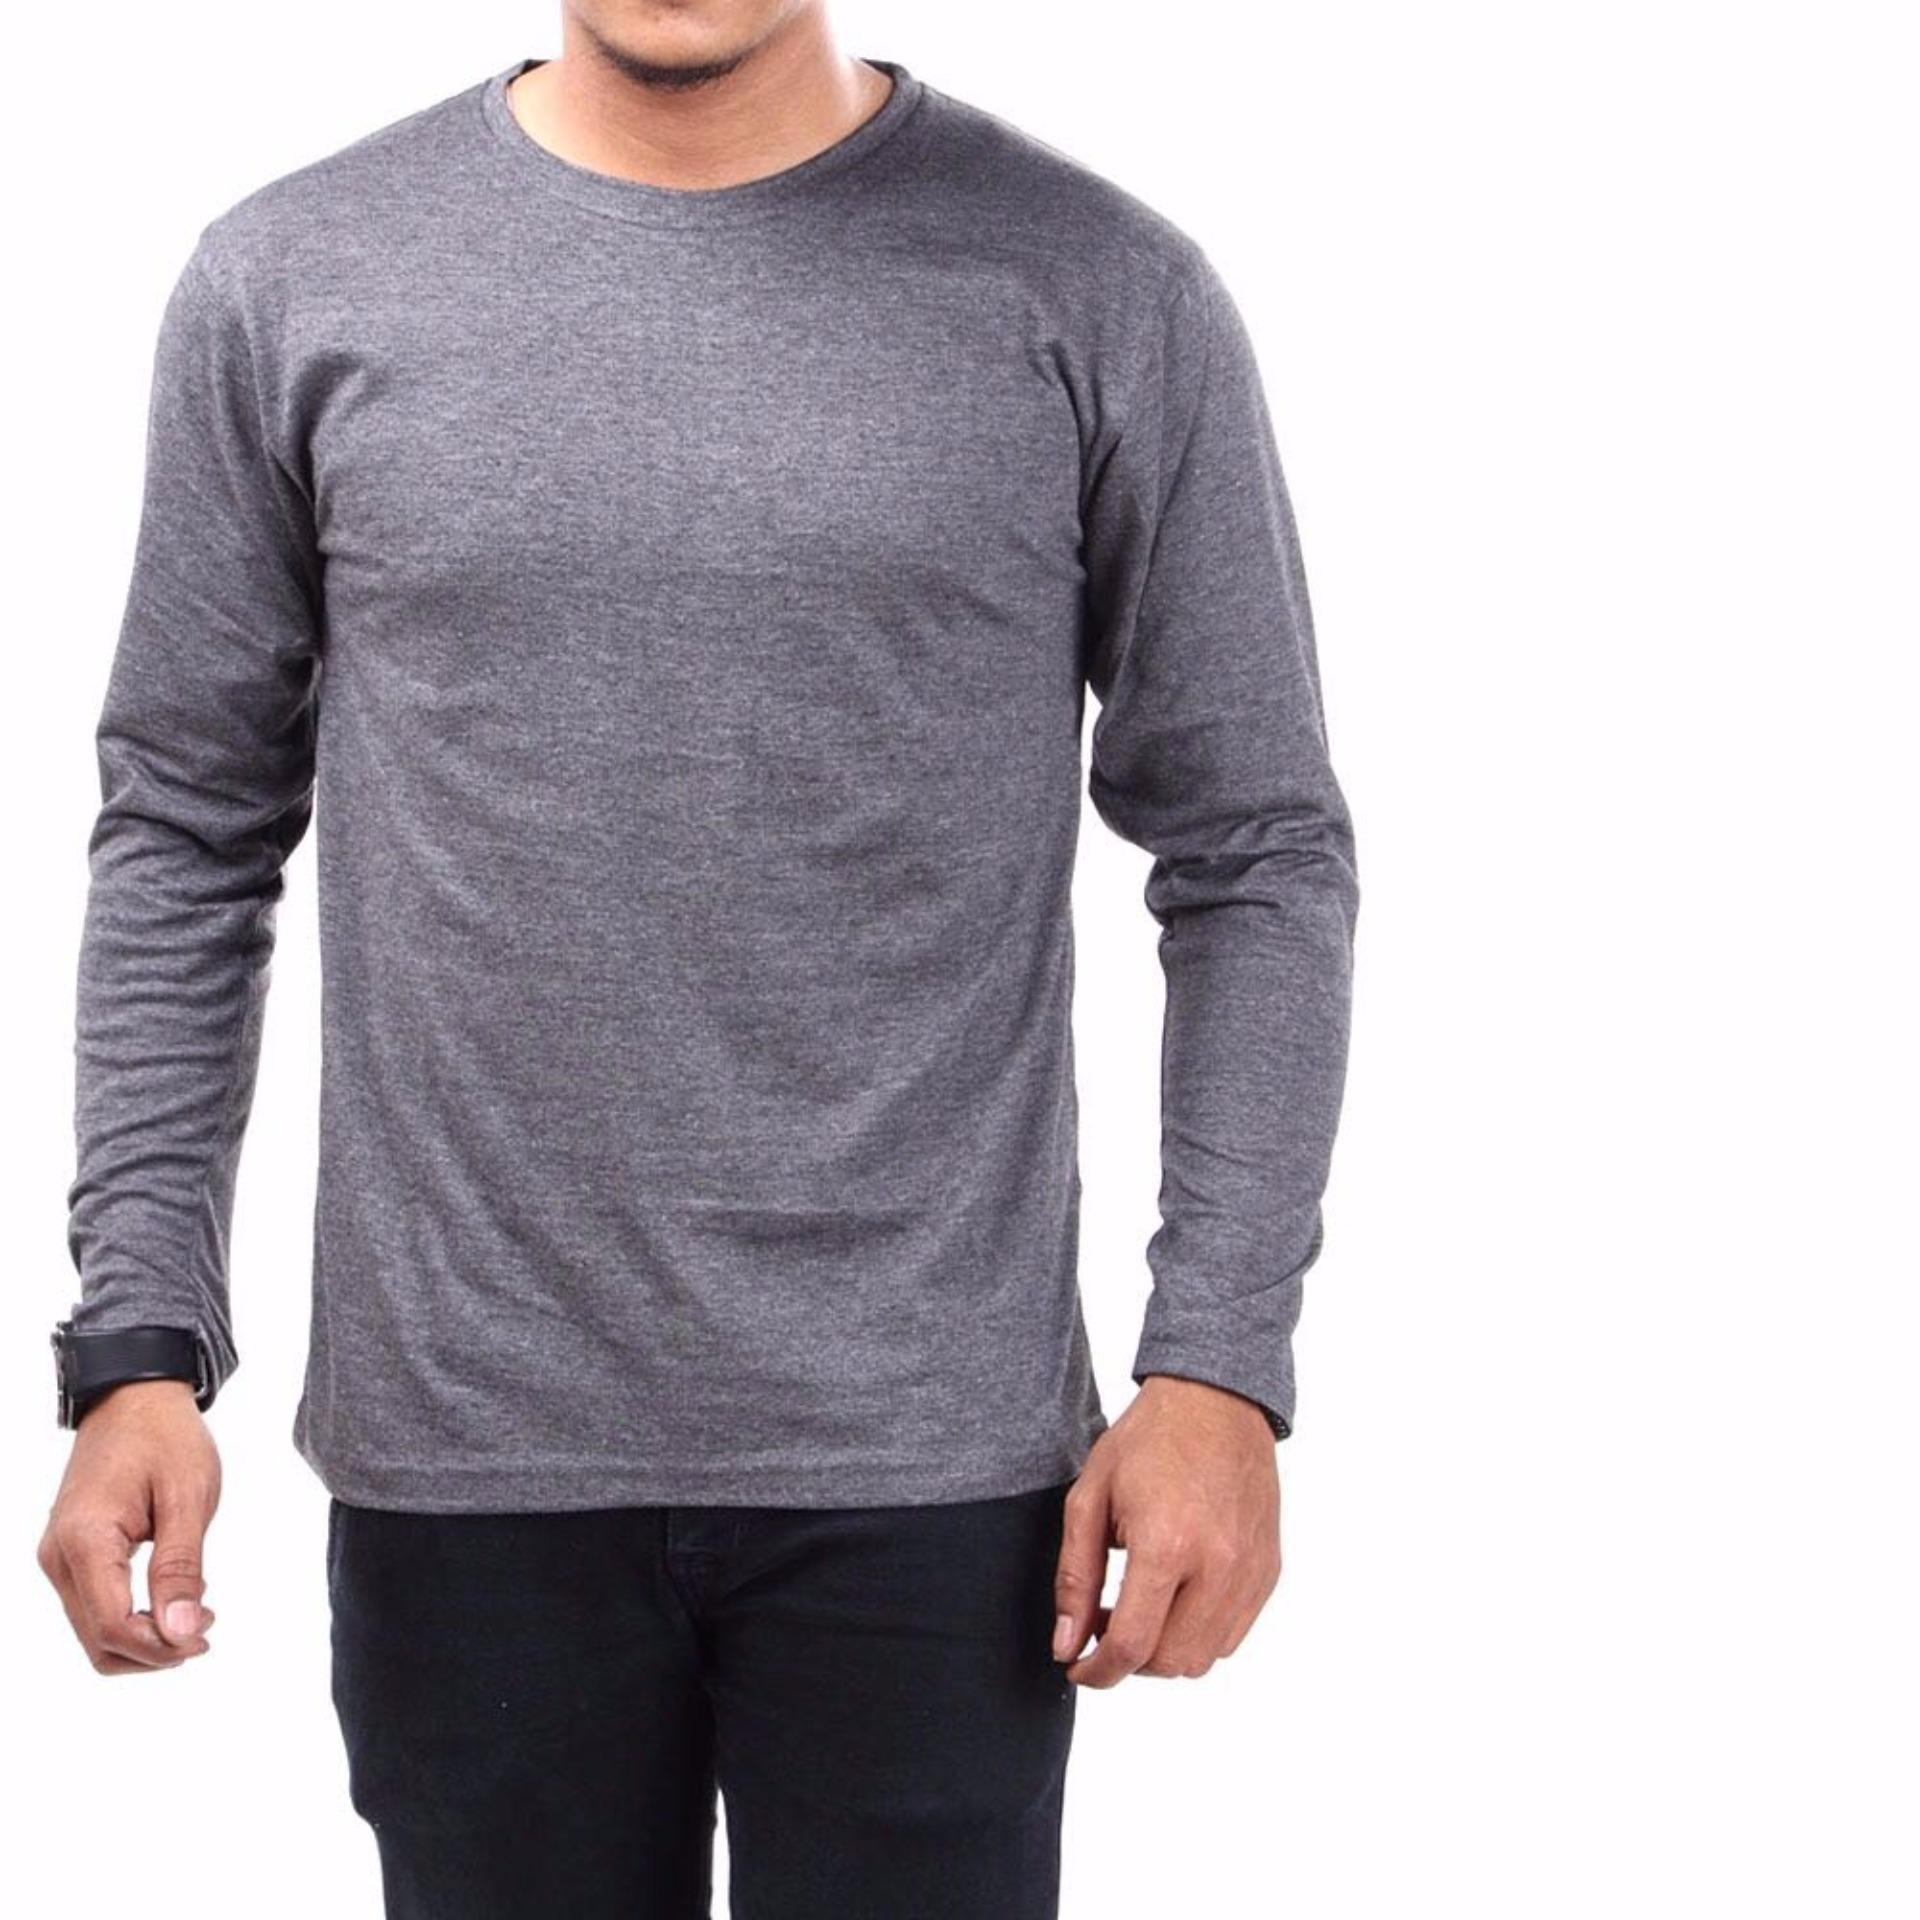 irfan Store95 - Kaos Polos Lengan Panjang O Neck - Abu Abu